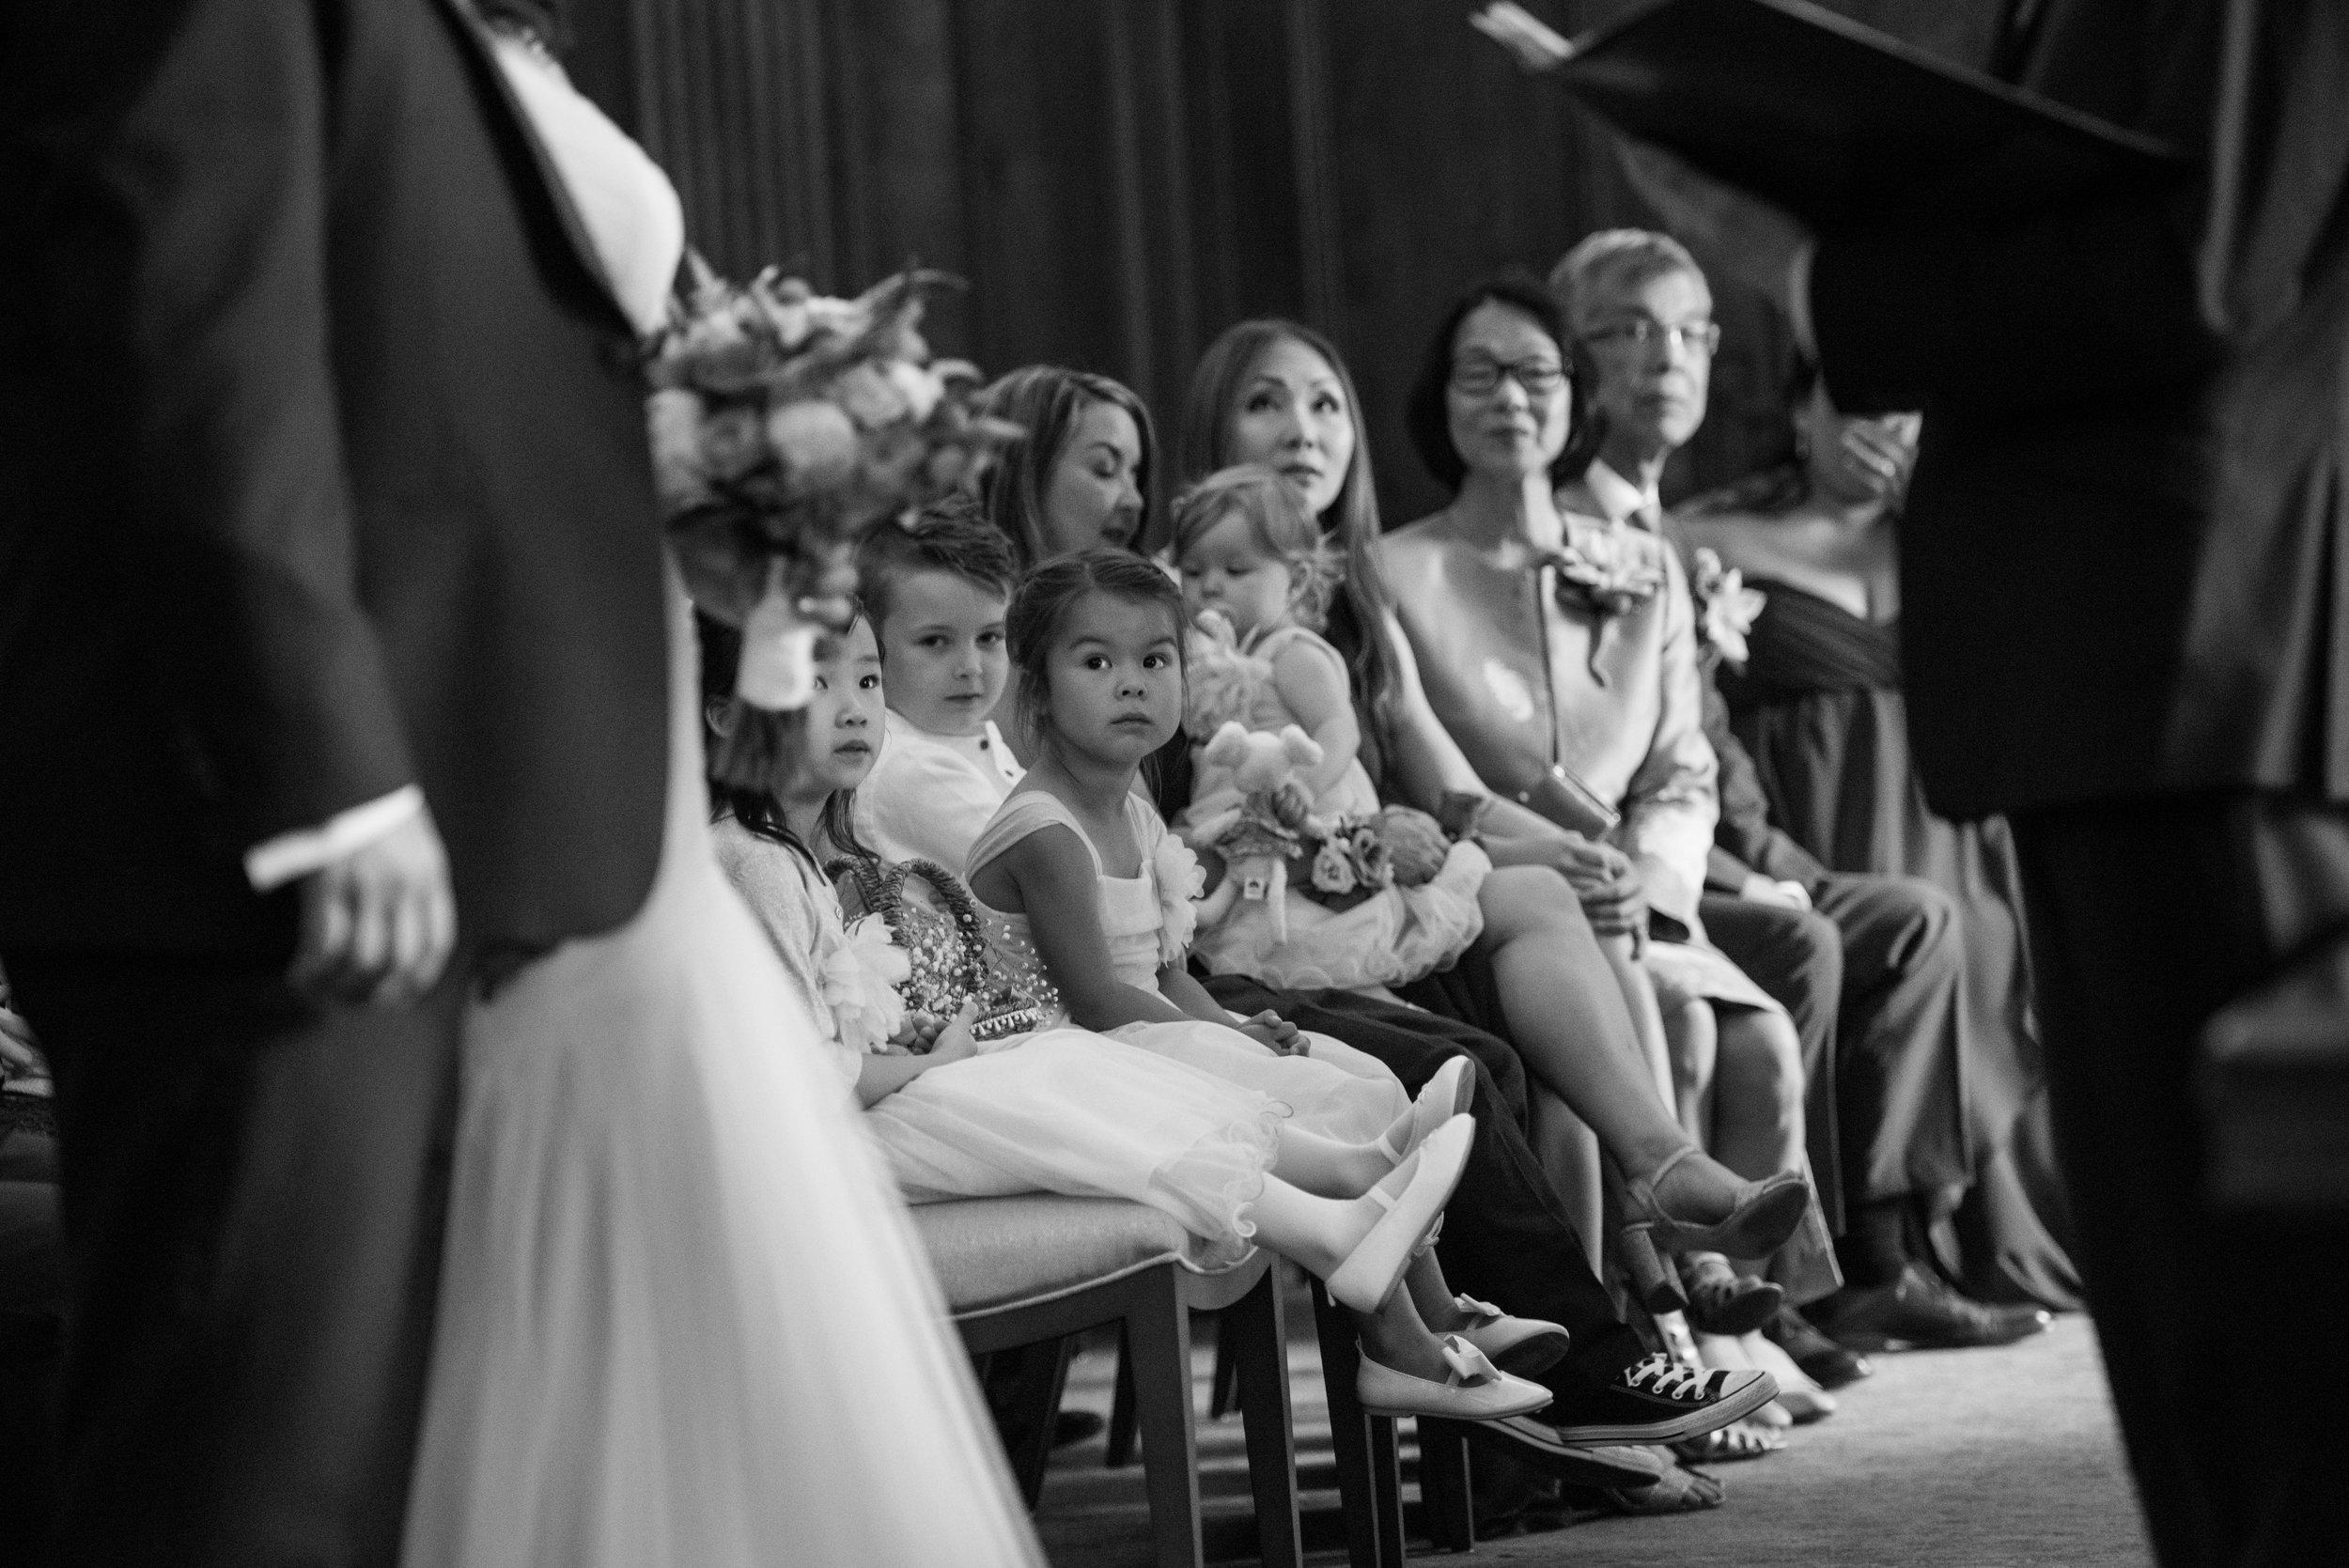 D&M_Marylebone Town Hall Wedding (94 of 239).jpg